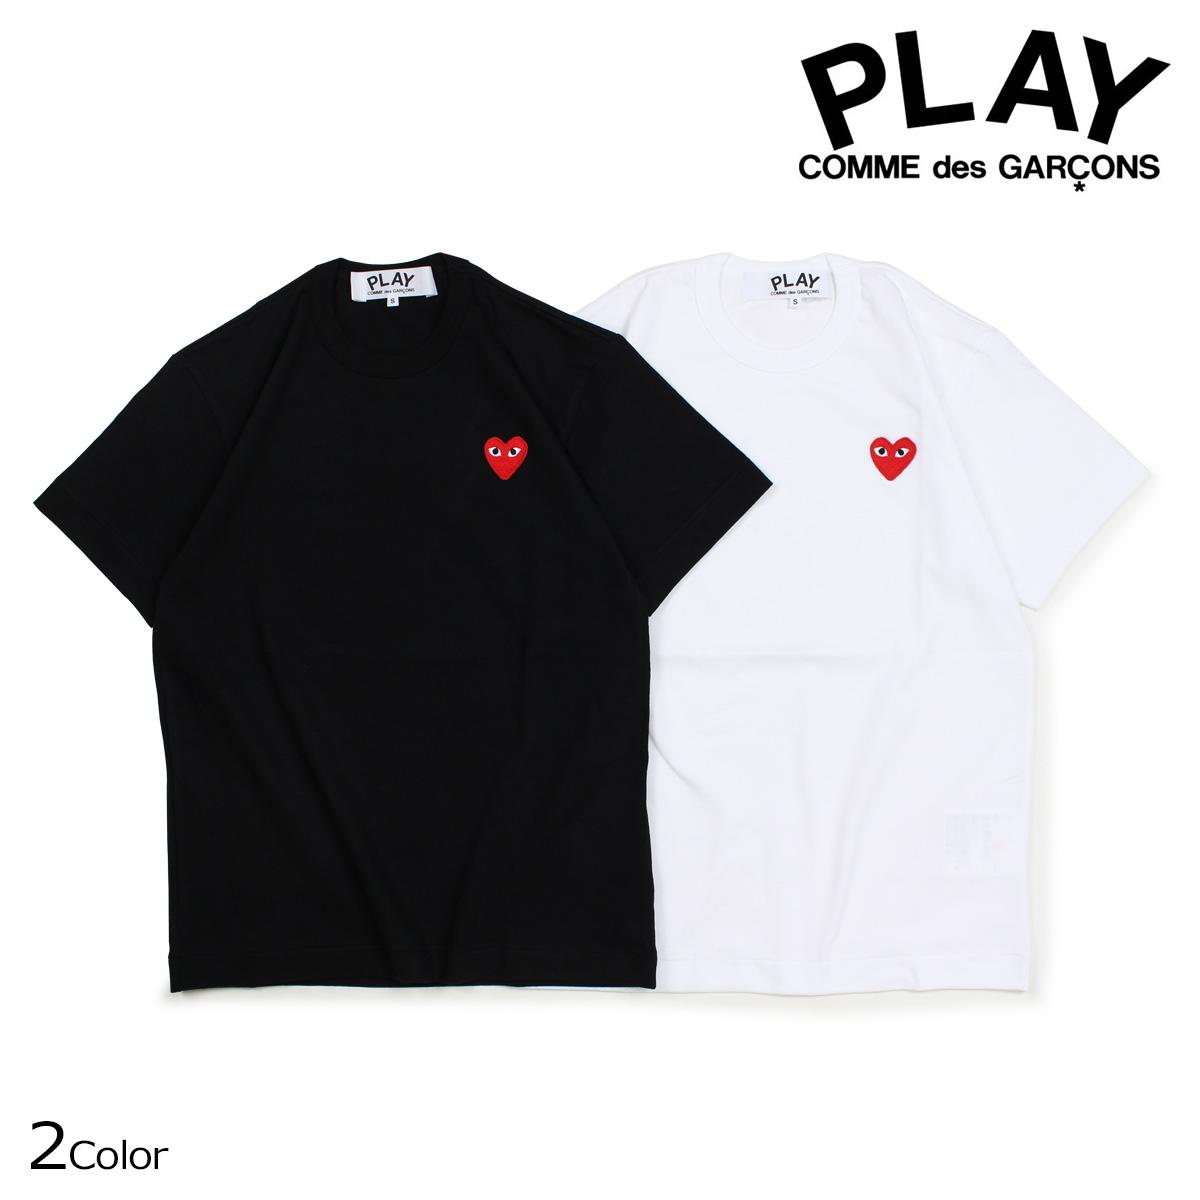 COMME des GARCONS PLAY Tシャツ 半袖 コムデギャルソン メンズ RED HEART T-SHIRT ブラック ホワイト AZT108 [10/3 新入荷]